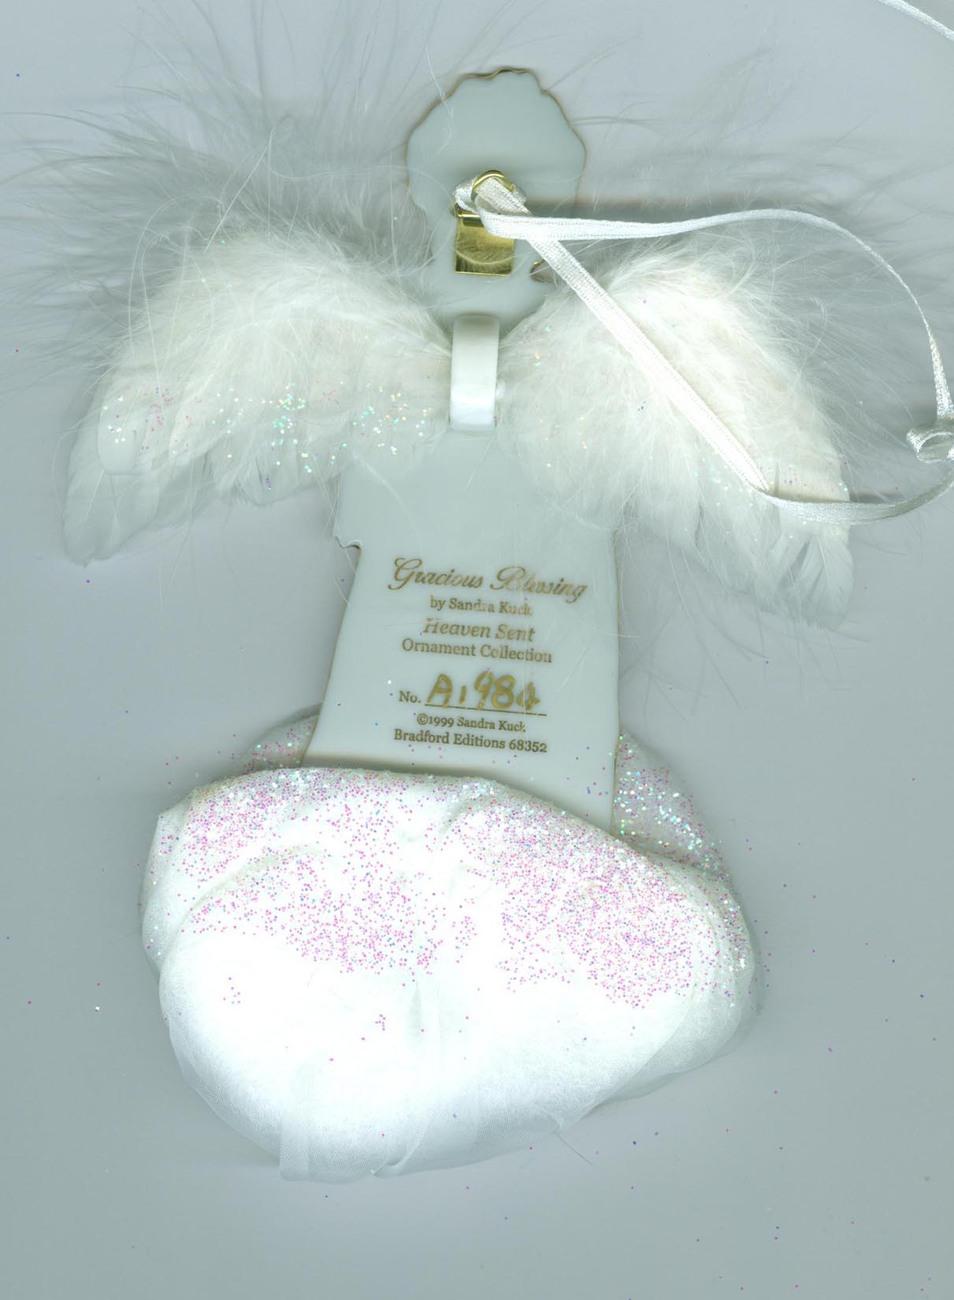 Gracious Blessing  Bradford Edition Porcelain Angel  1999 Christmas